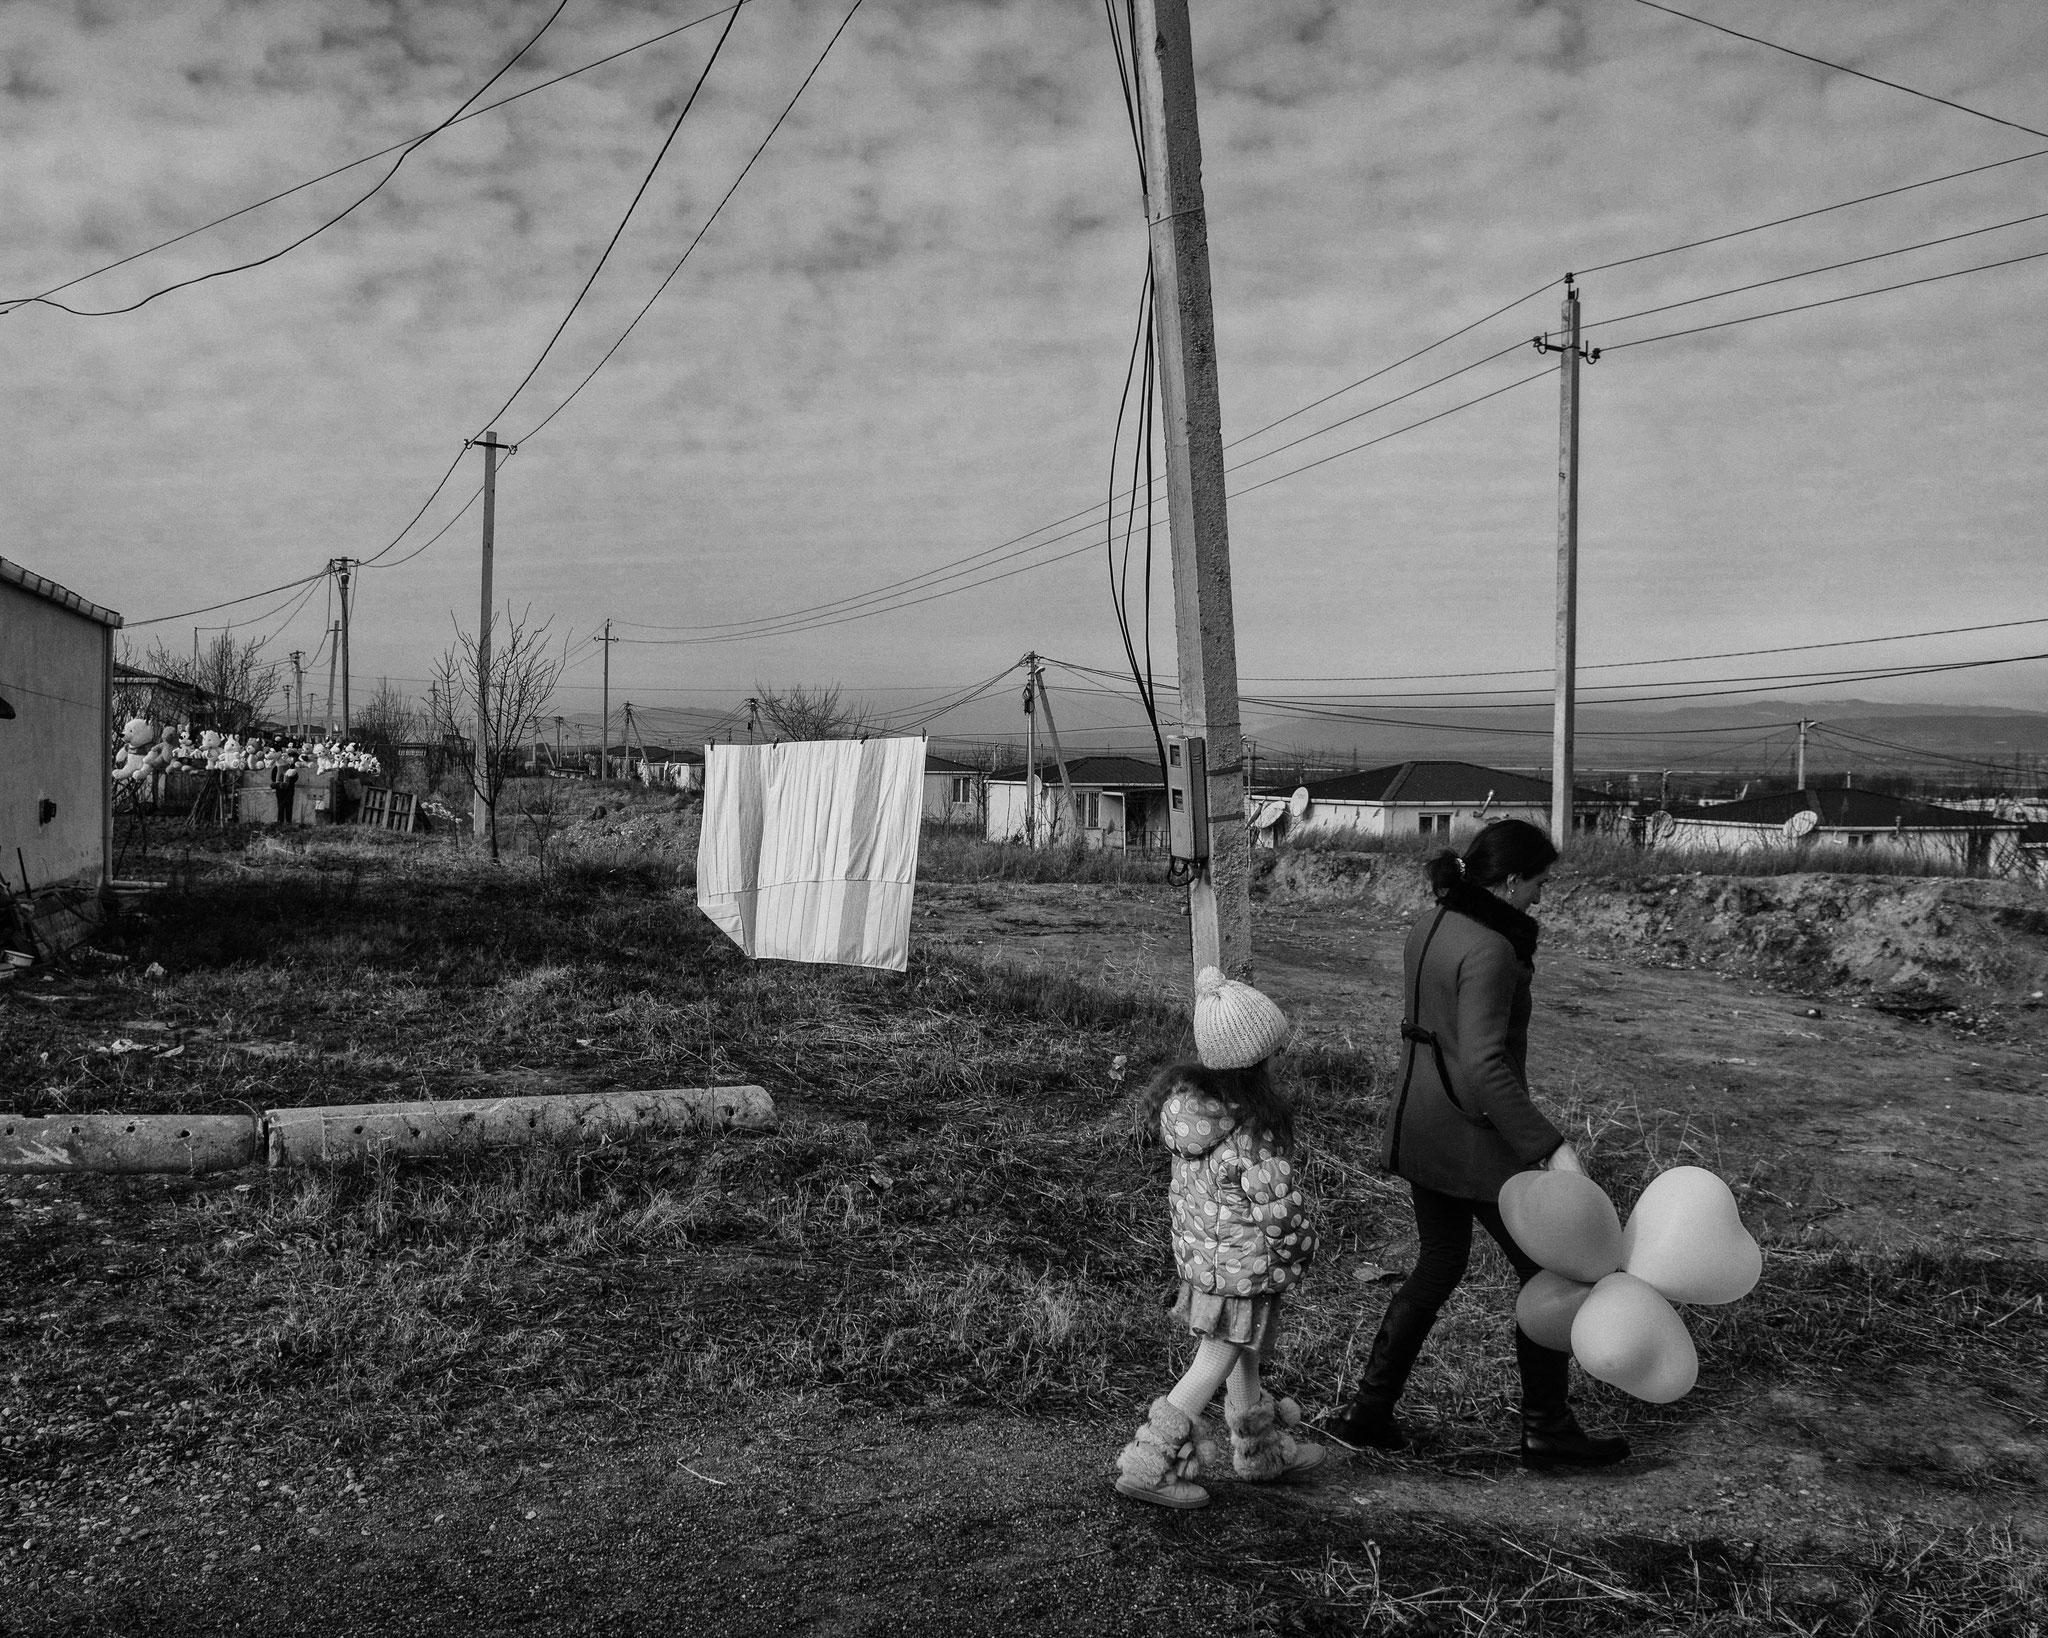 IDP from South Ossetia, Tserovani Refugee Camp, Georgia